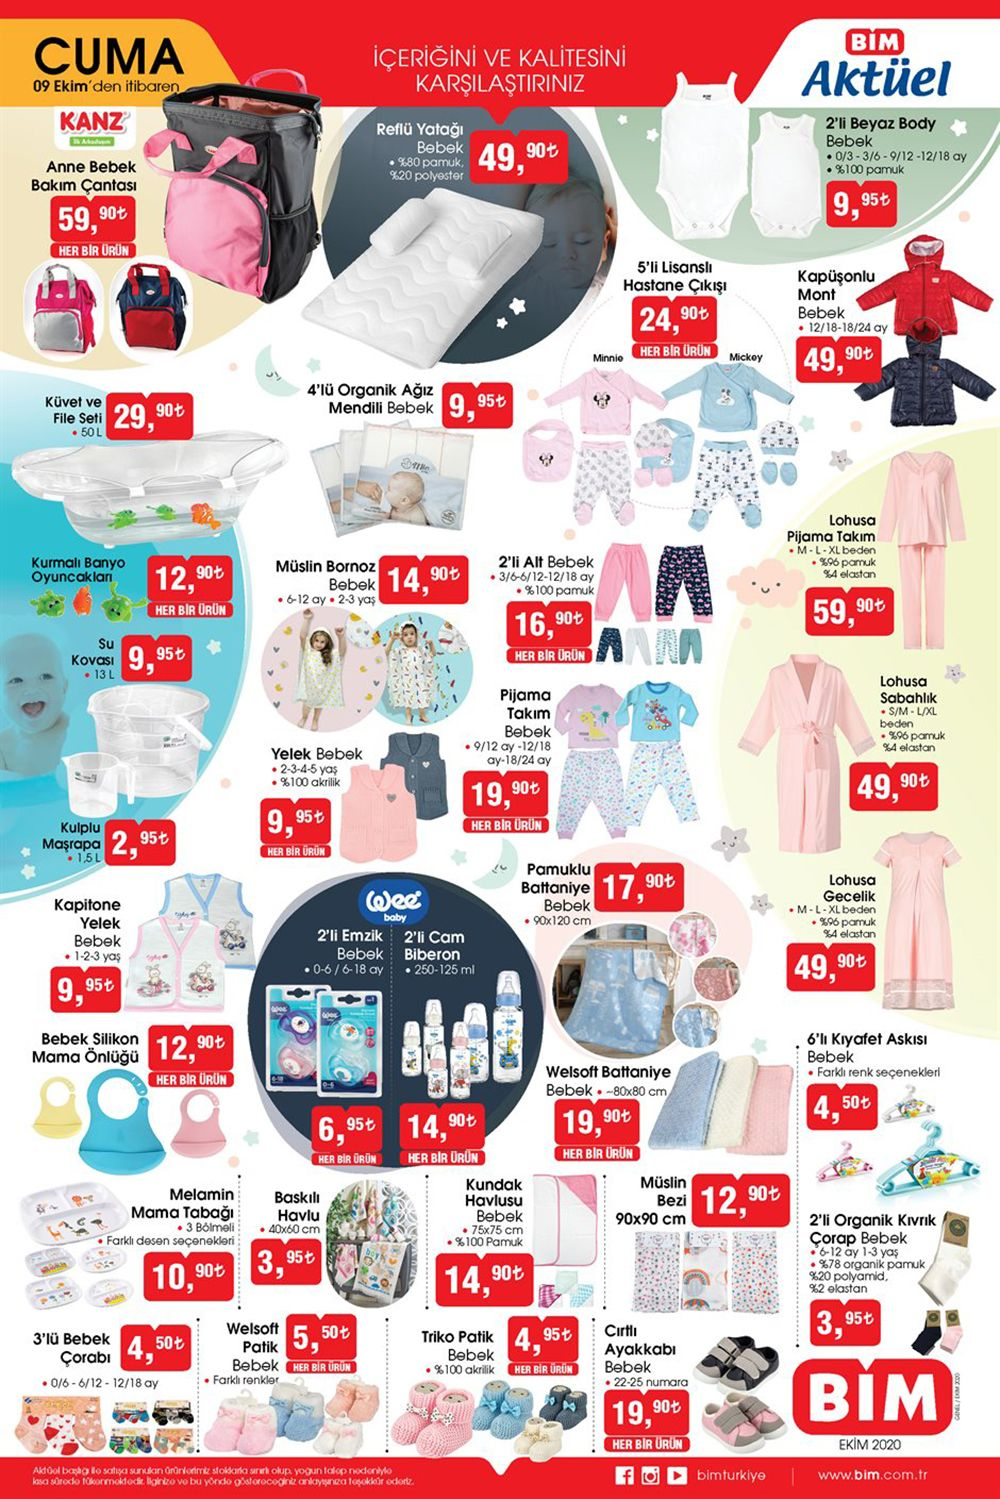 Bim-9-Ekim-2020-aktuel-bebek-tekstili-Urunleri-Katalogu